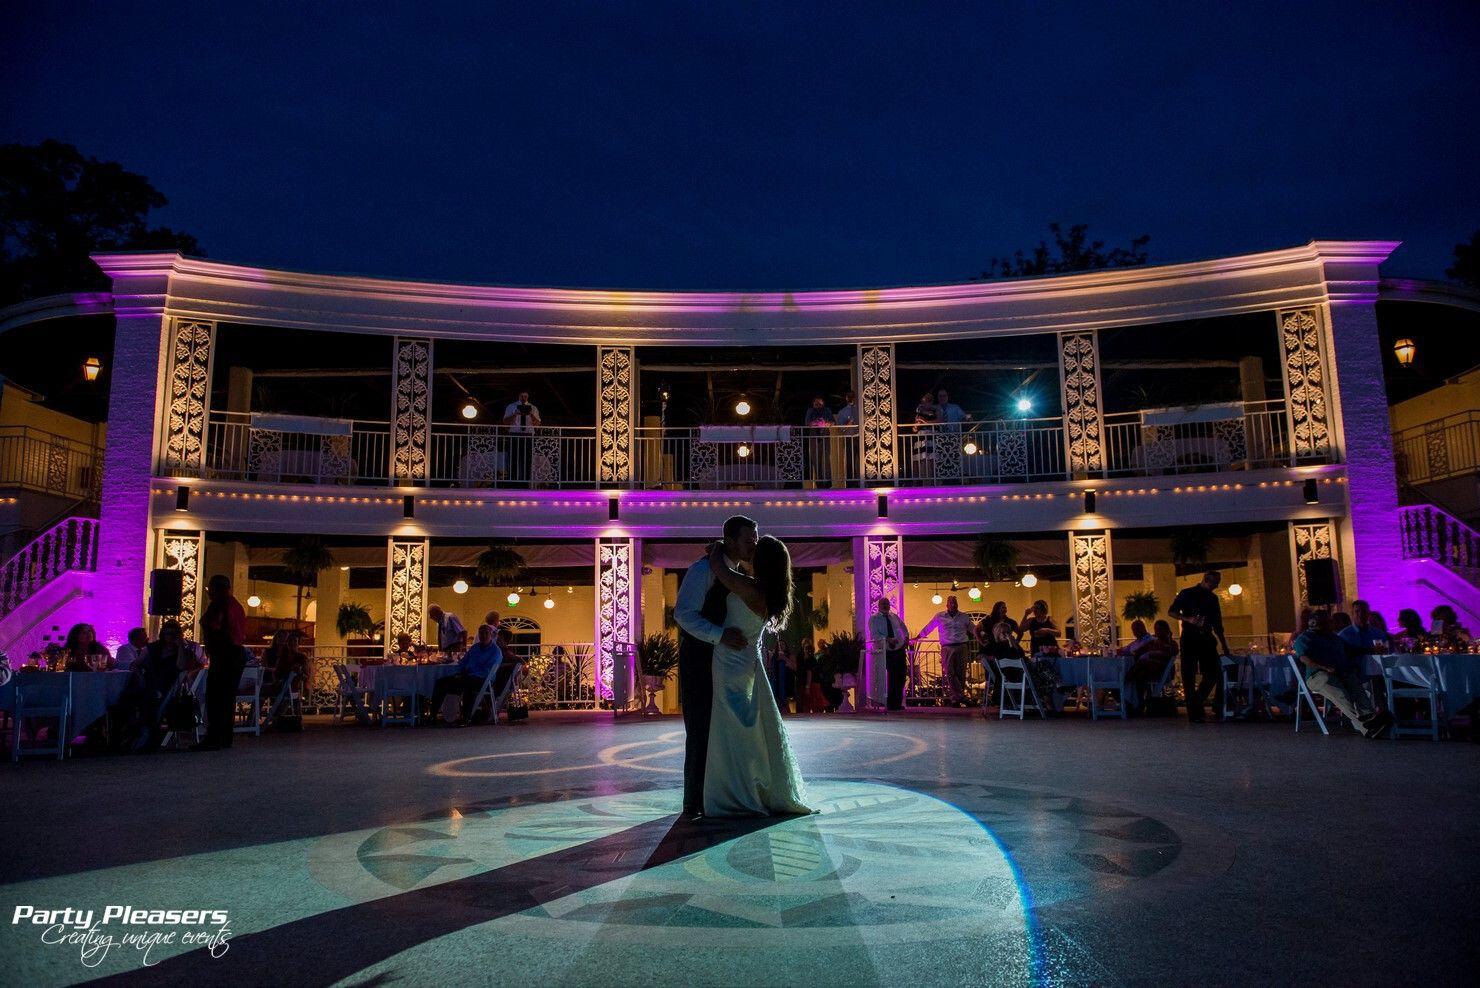 Couple shares first dance with purple uplights and intelligent light spotlight  Photo Credit- Dolce Vita  #CincinnatiWedding #PartyPleasers #Uplights #Intelligentlight